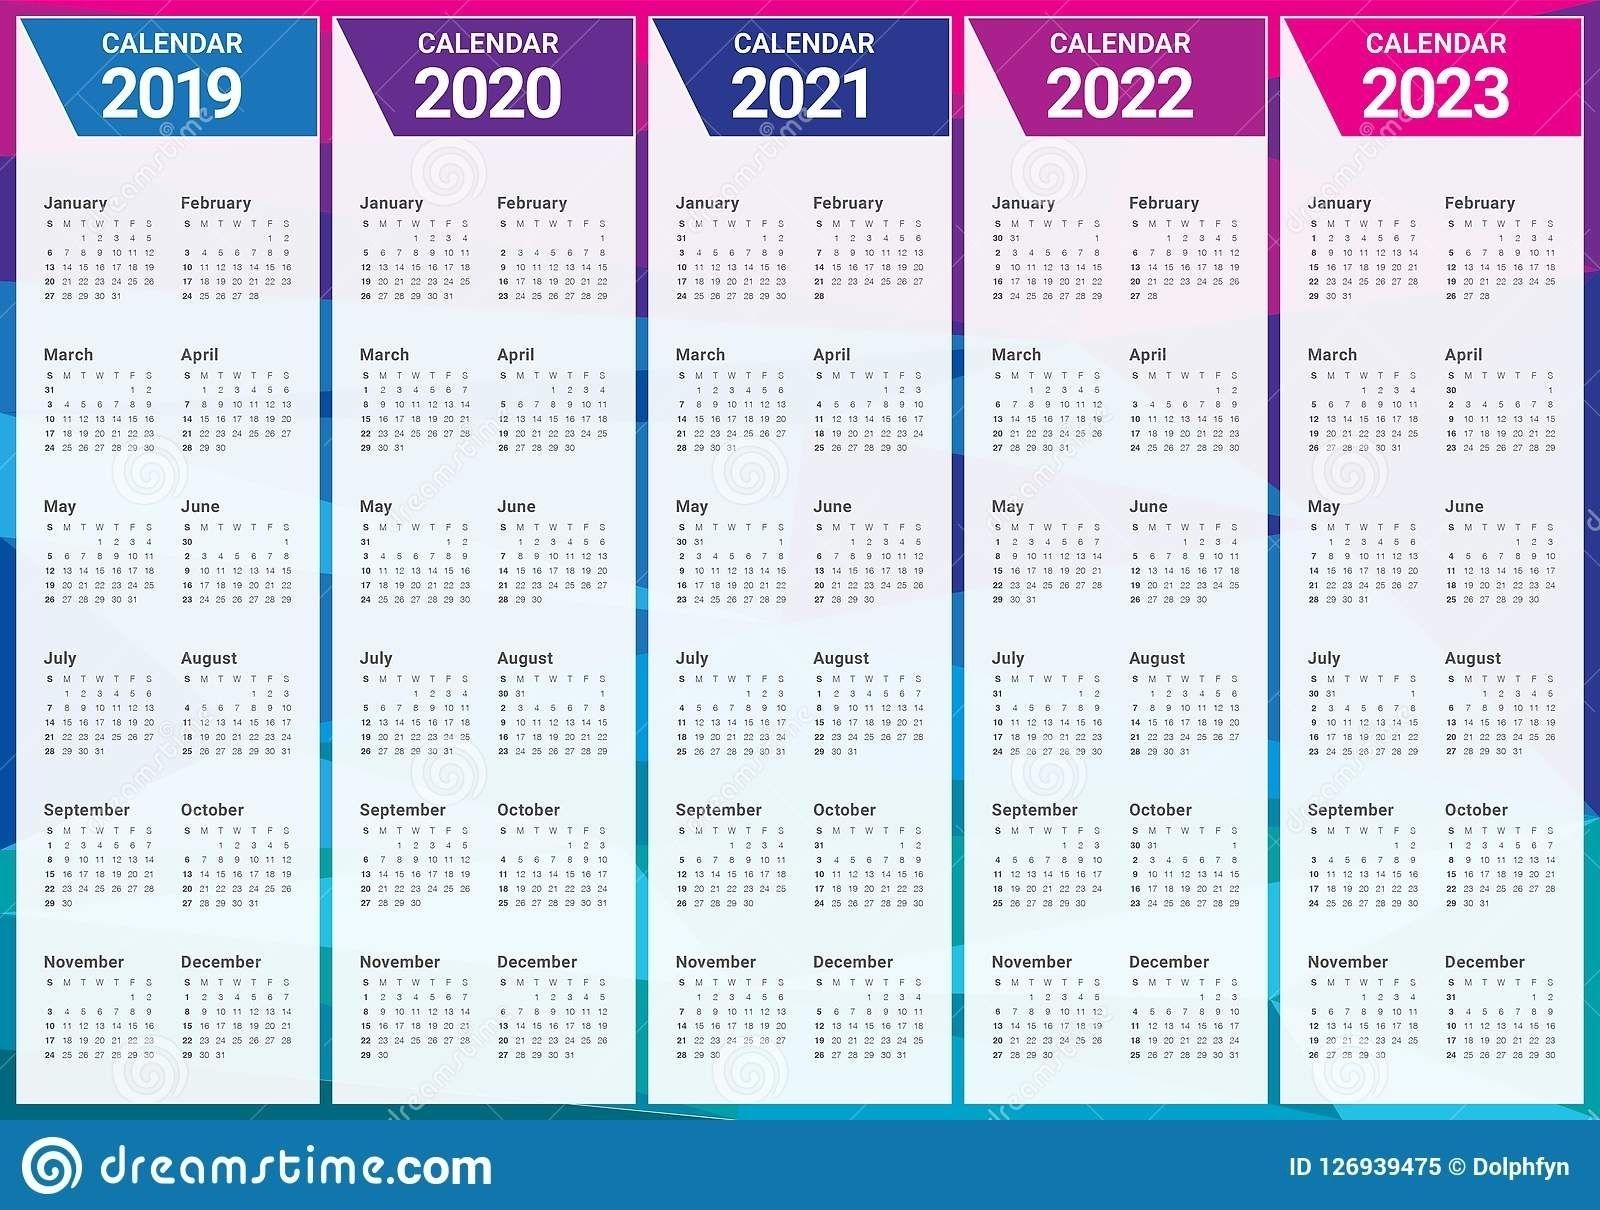 Calendar Years 2019 2020 2021 2022 2023 - Calendar